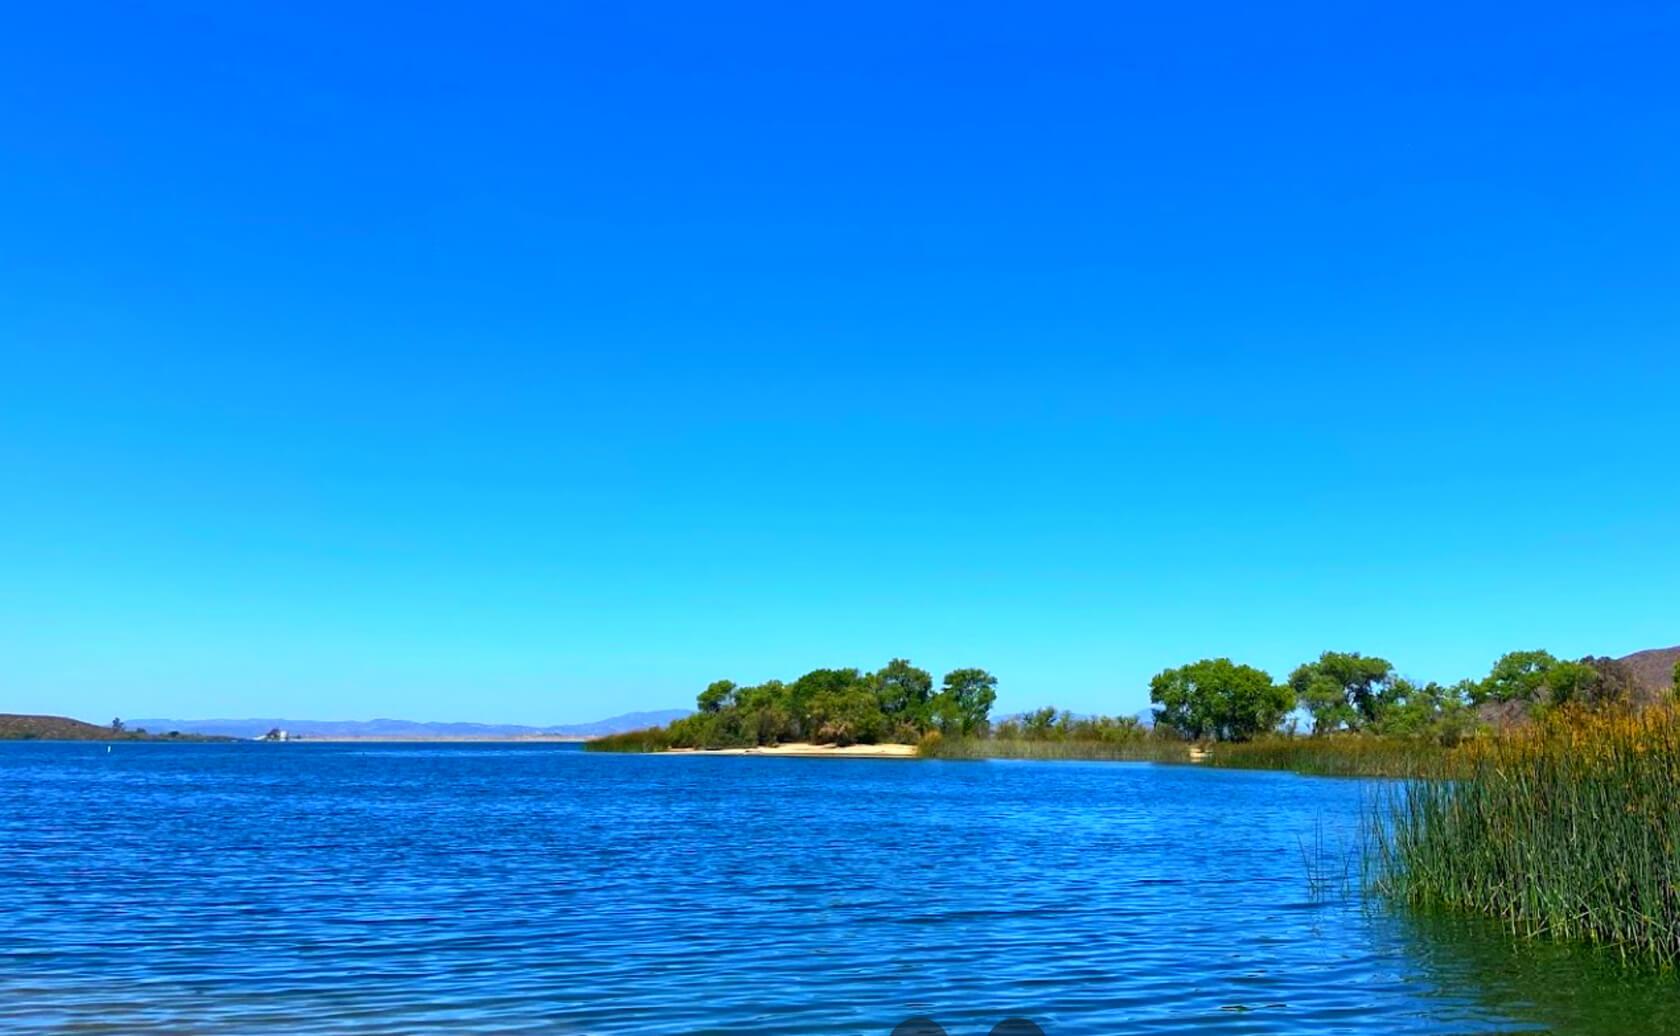 Lake-Skinner-Fishing-Guide-Report-Winchester-CA-03